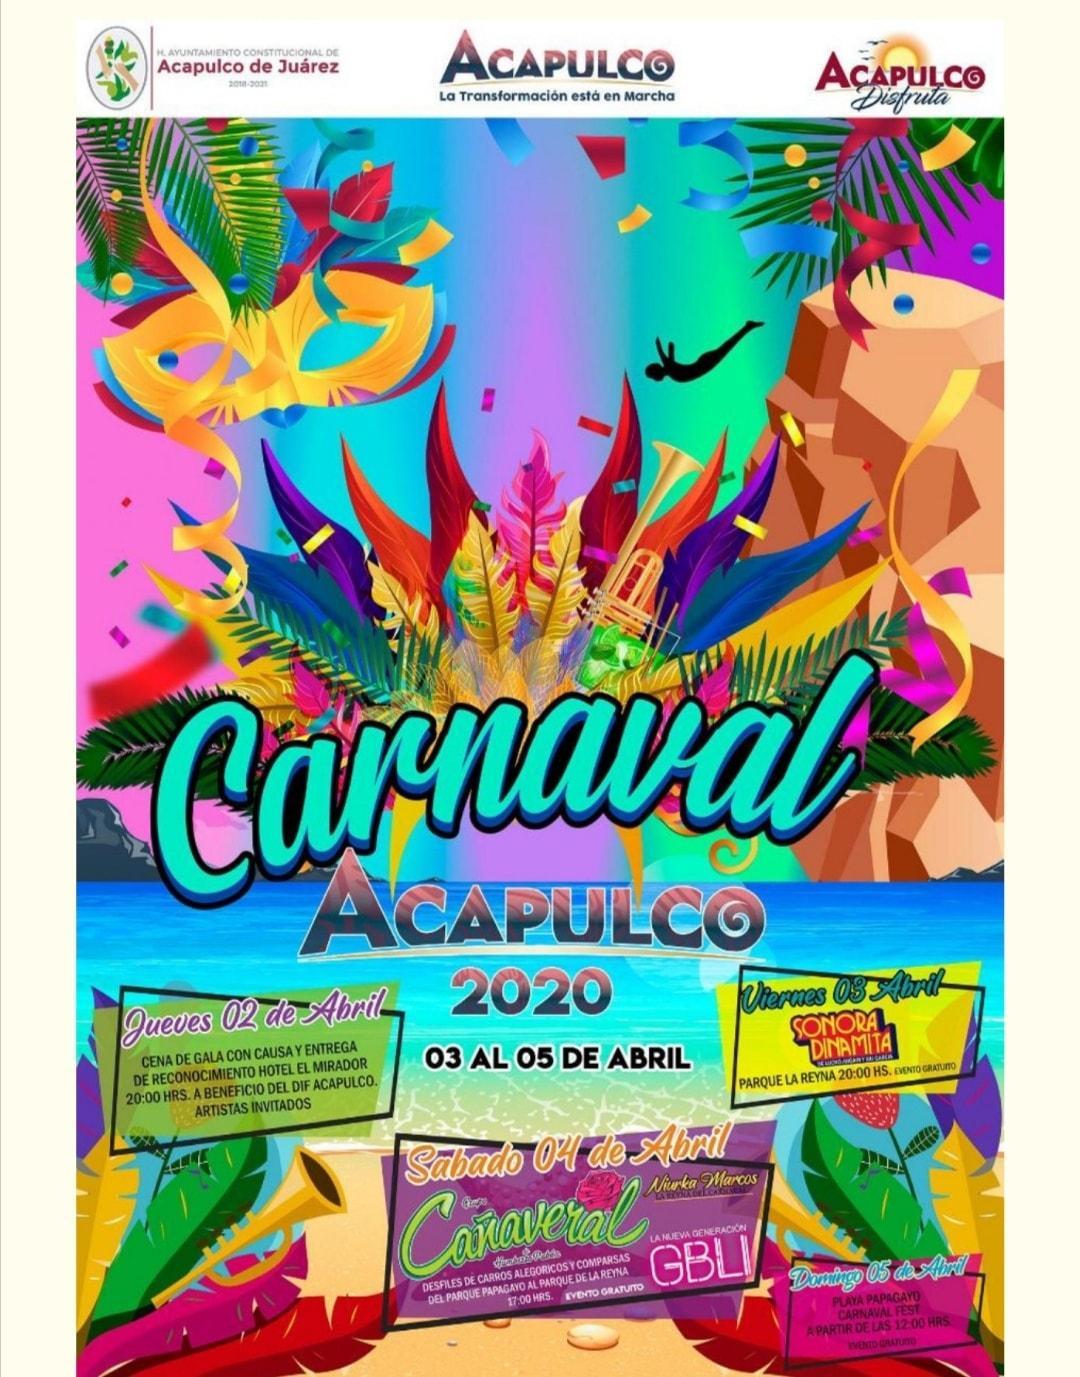 Carnaval Acapulco 2020